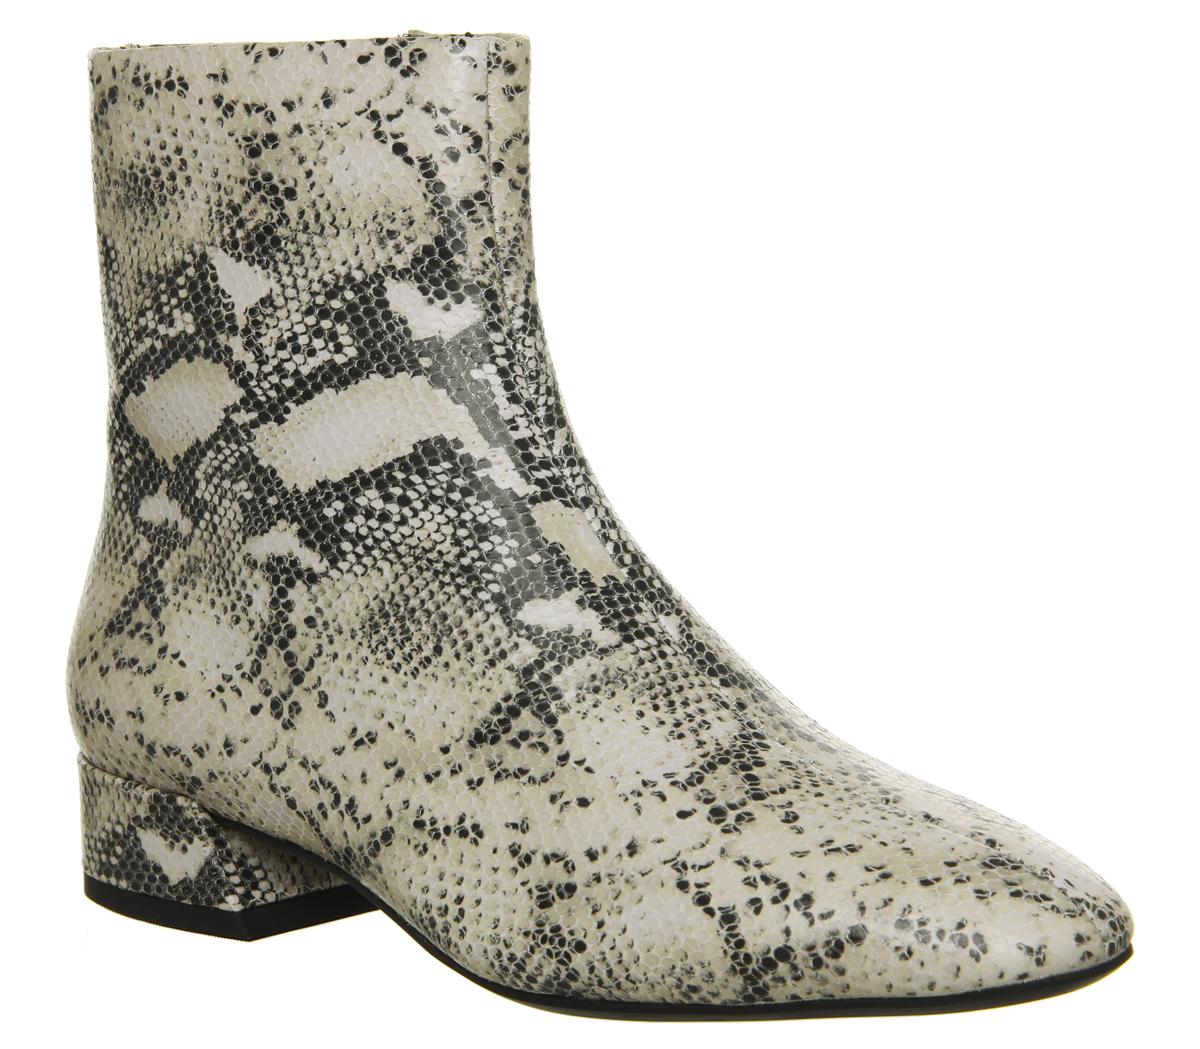 d4b3649f302 Sentinel Womens Vagabond Joyce Ankle Boots Sand Black Boots